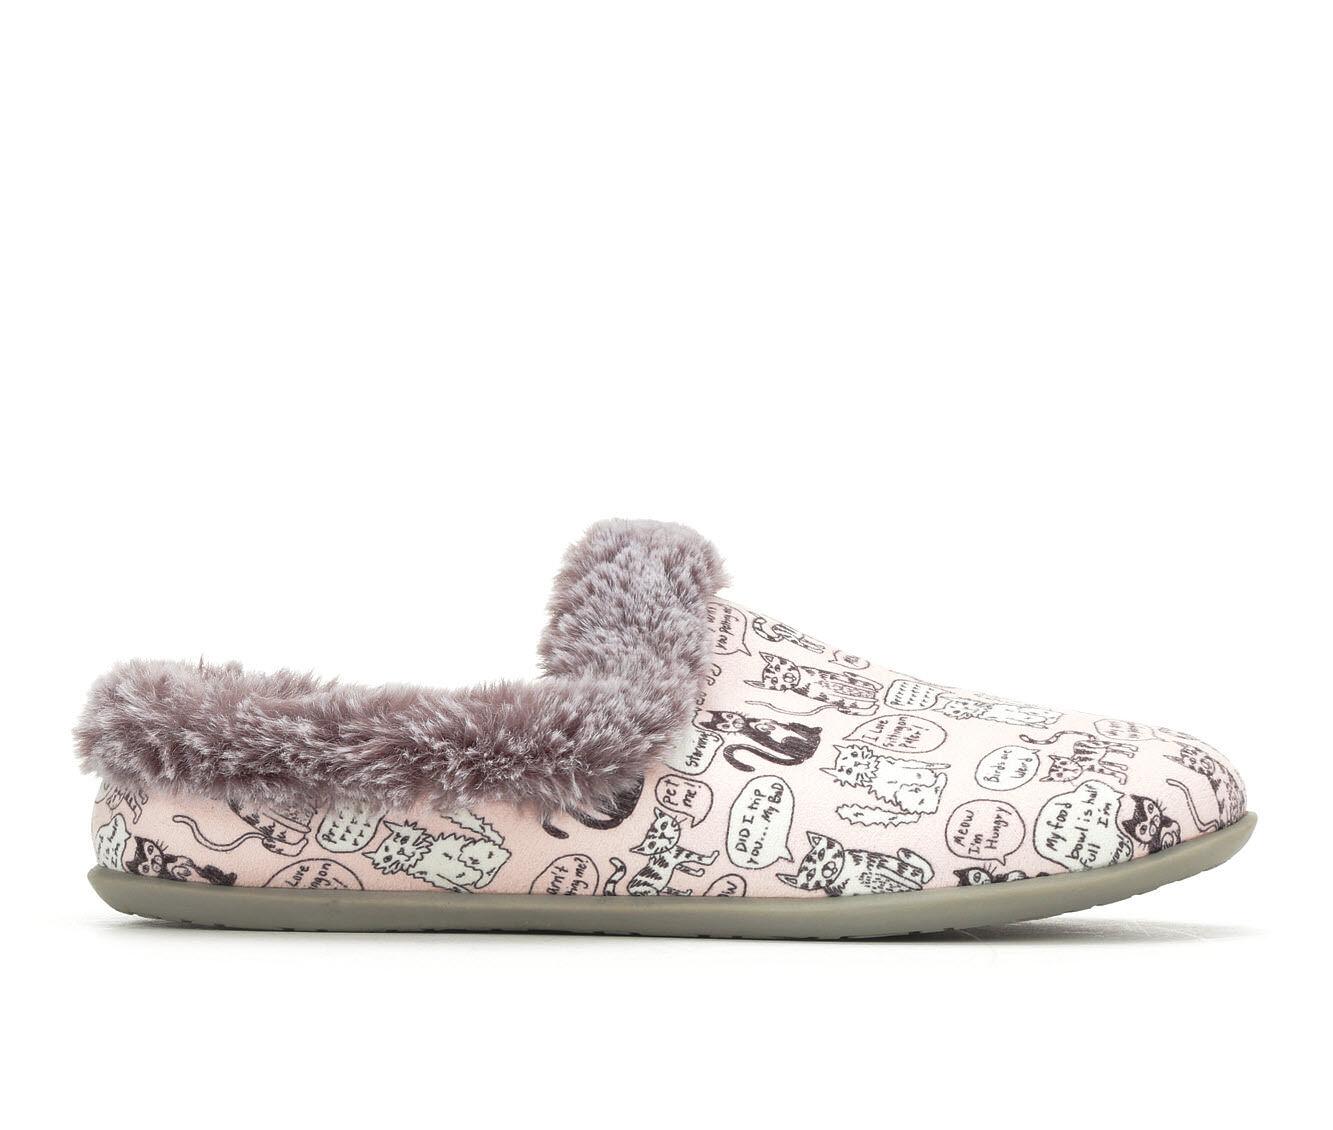 BOBS Cuddle Kitties Slipper Pink/Blk/White